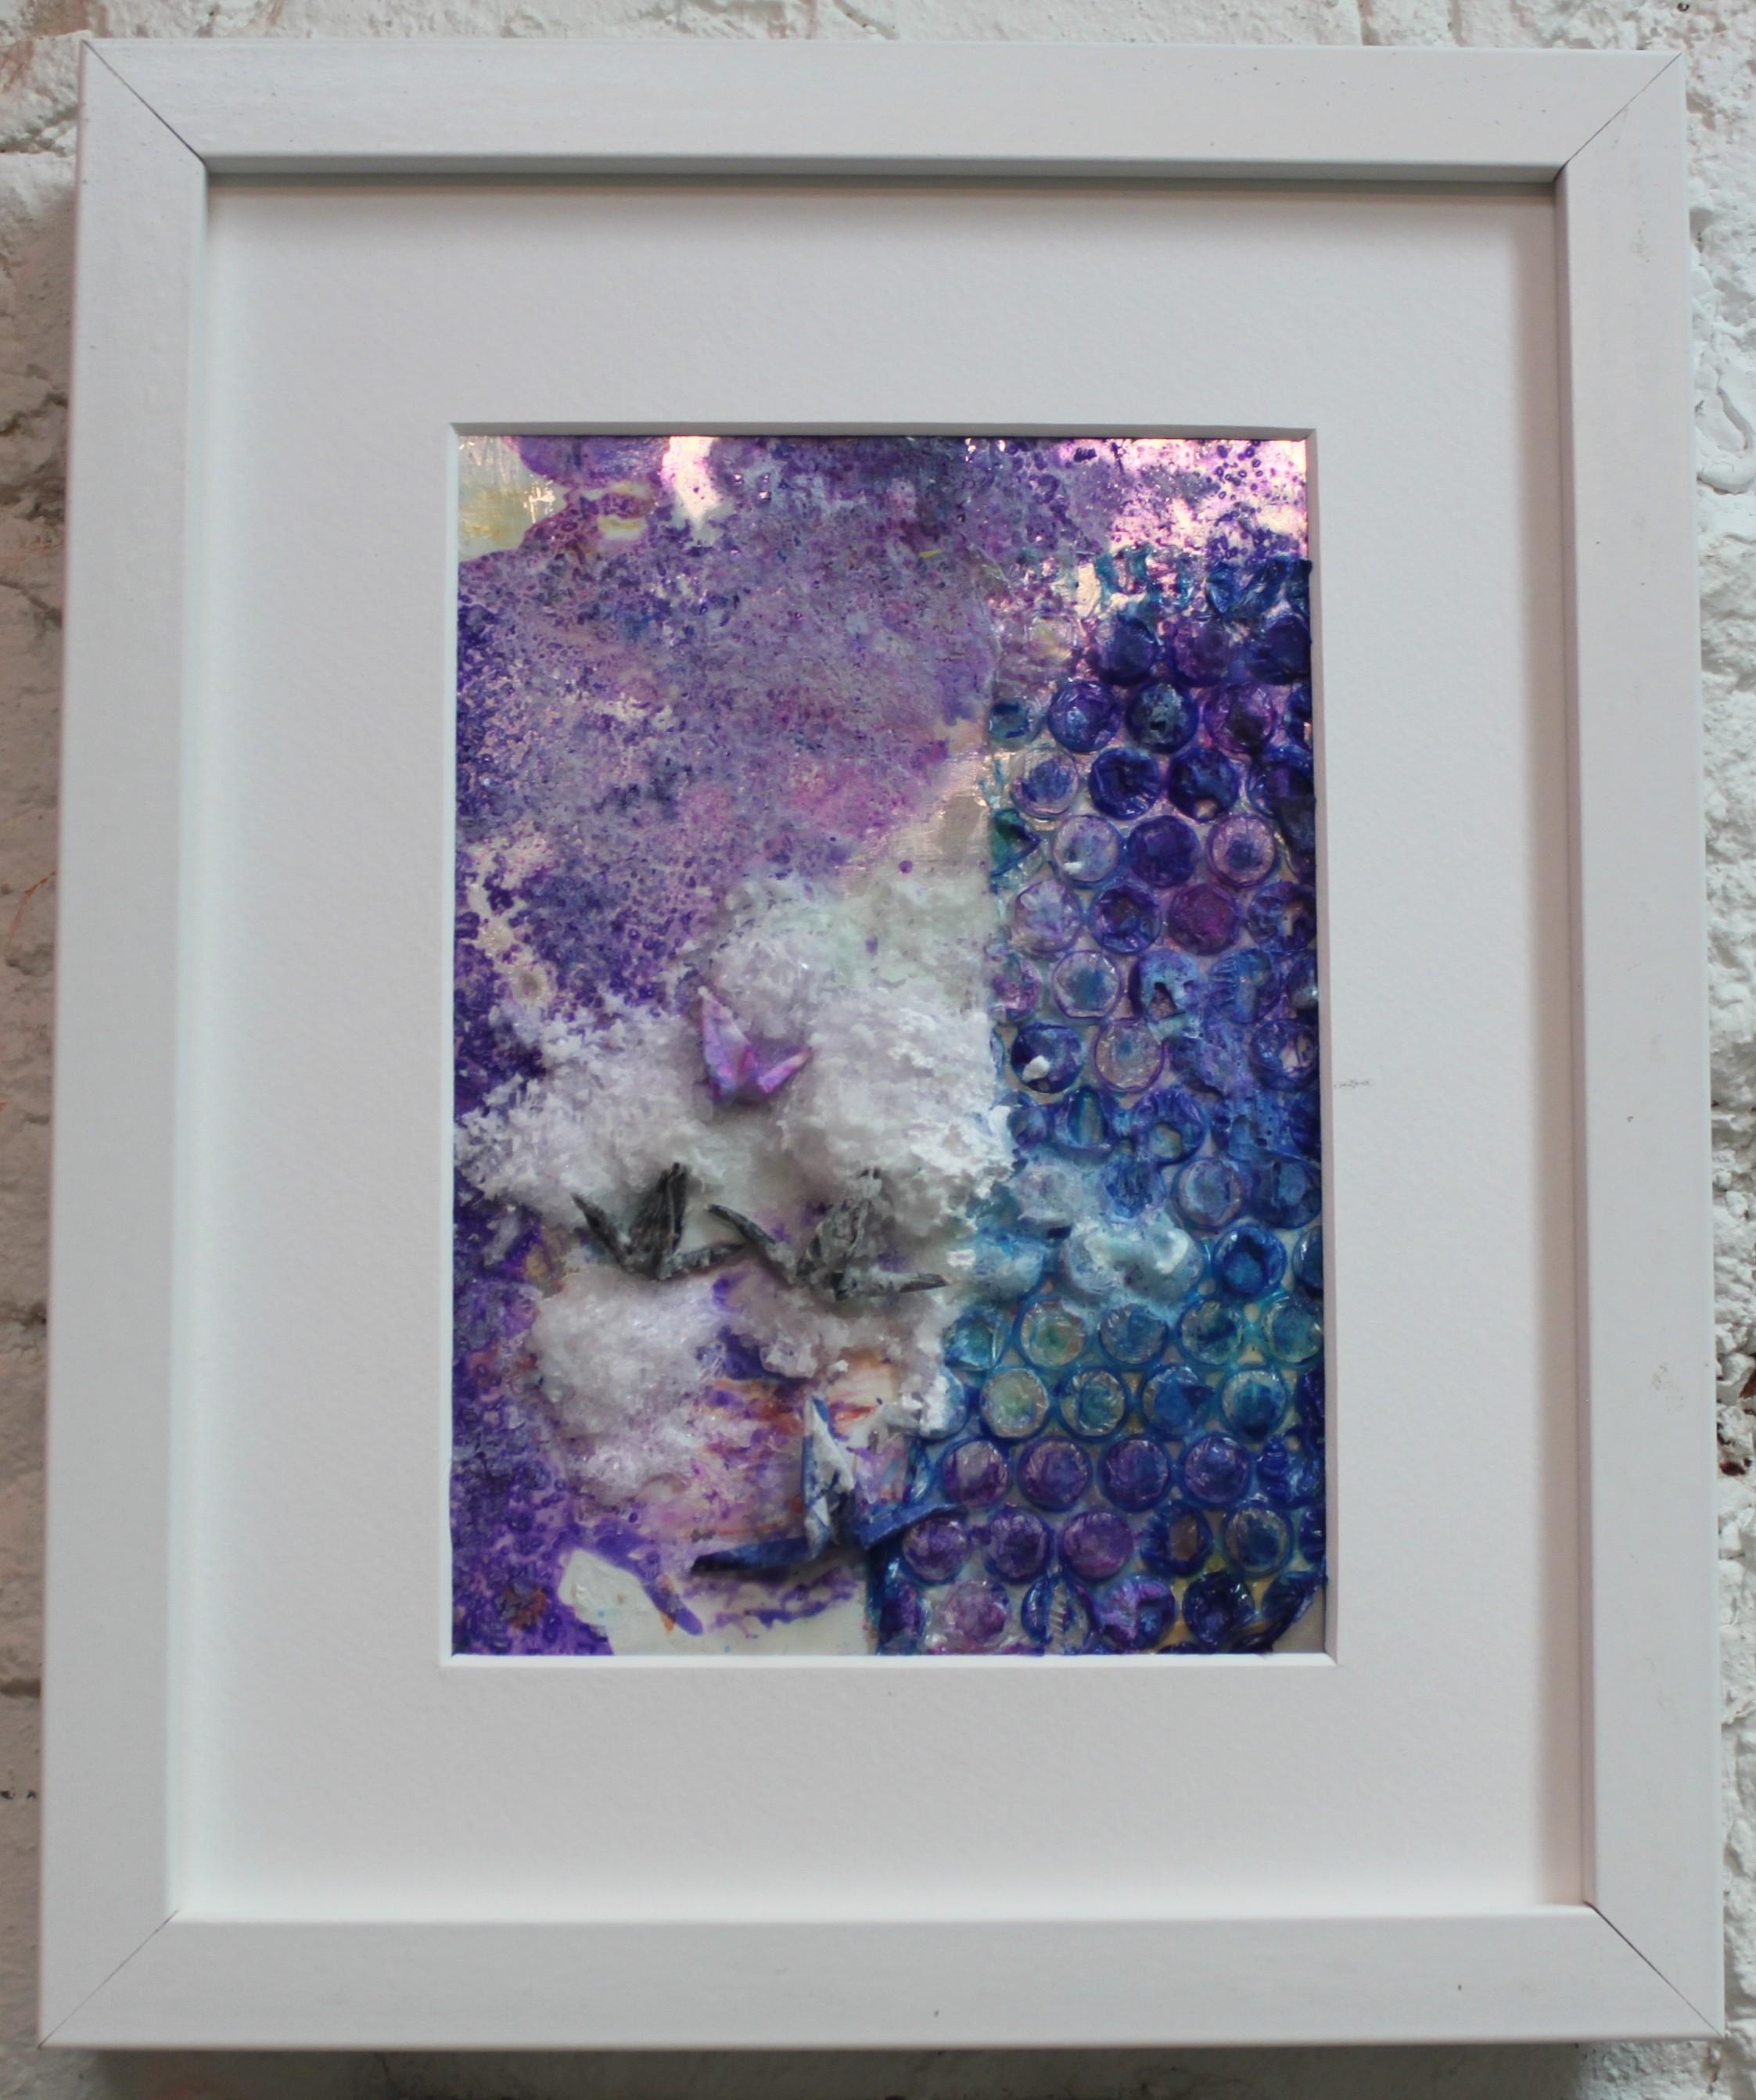 MiriamJuliannaSutton-Untitled-mixedmedia-9x11-2018-$150.JPG